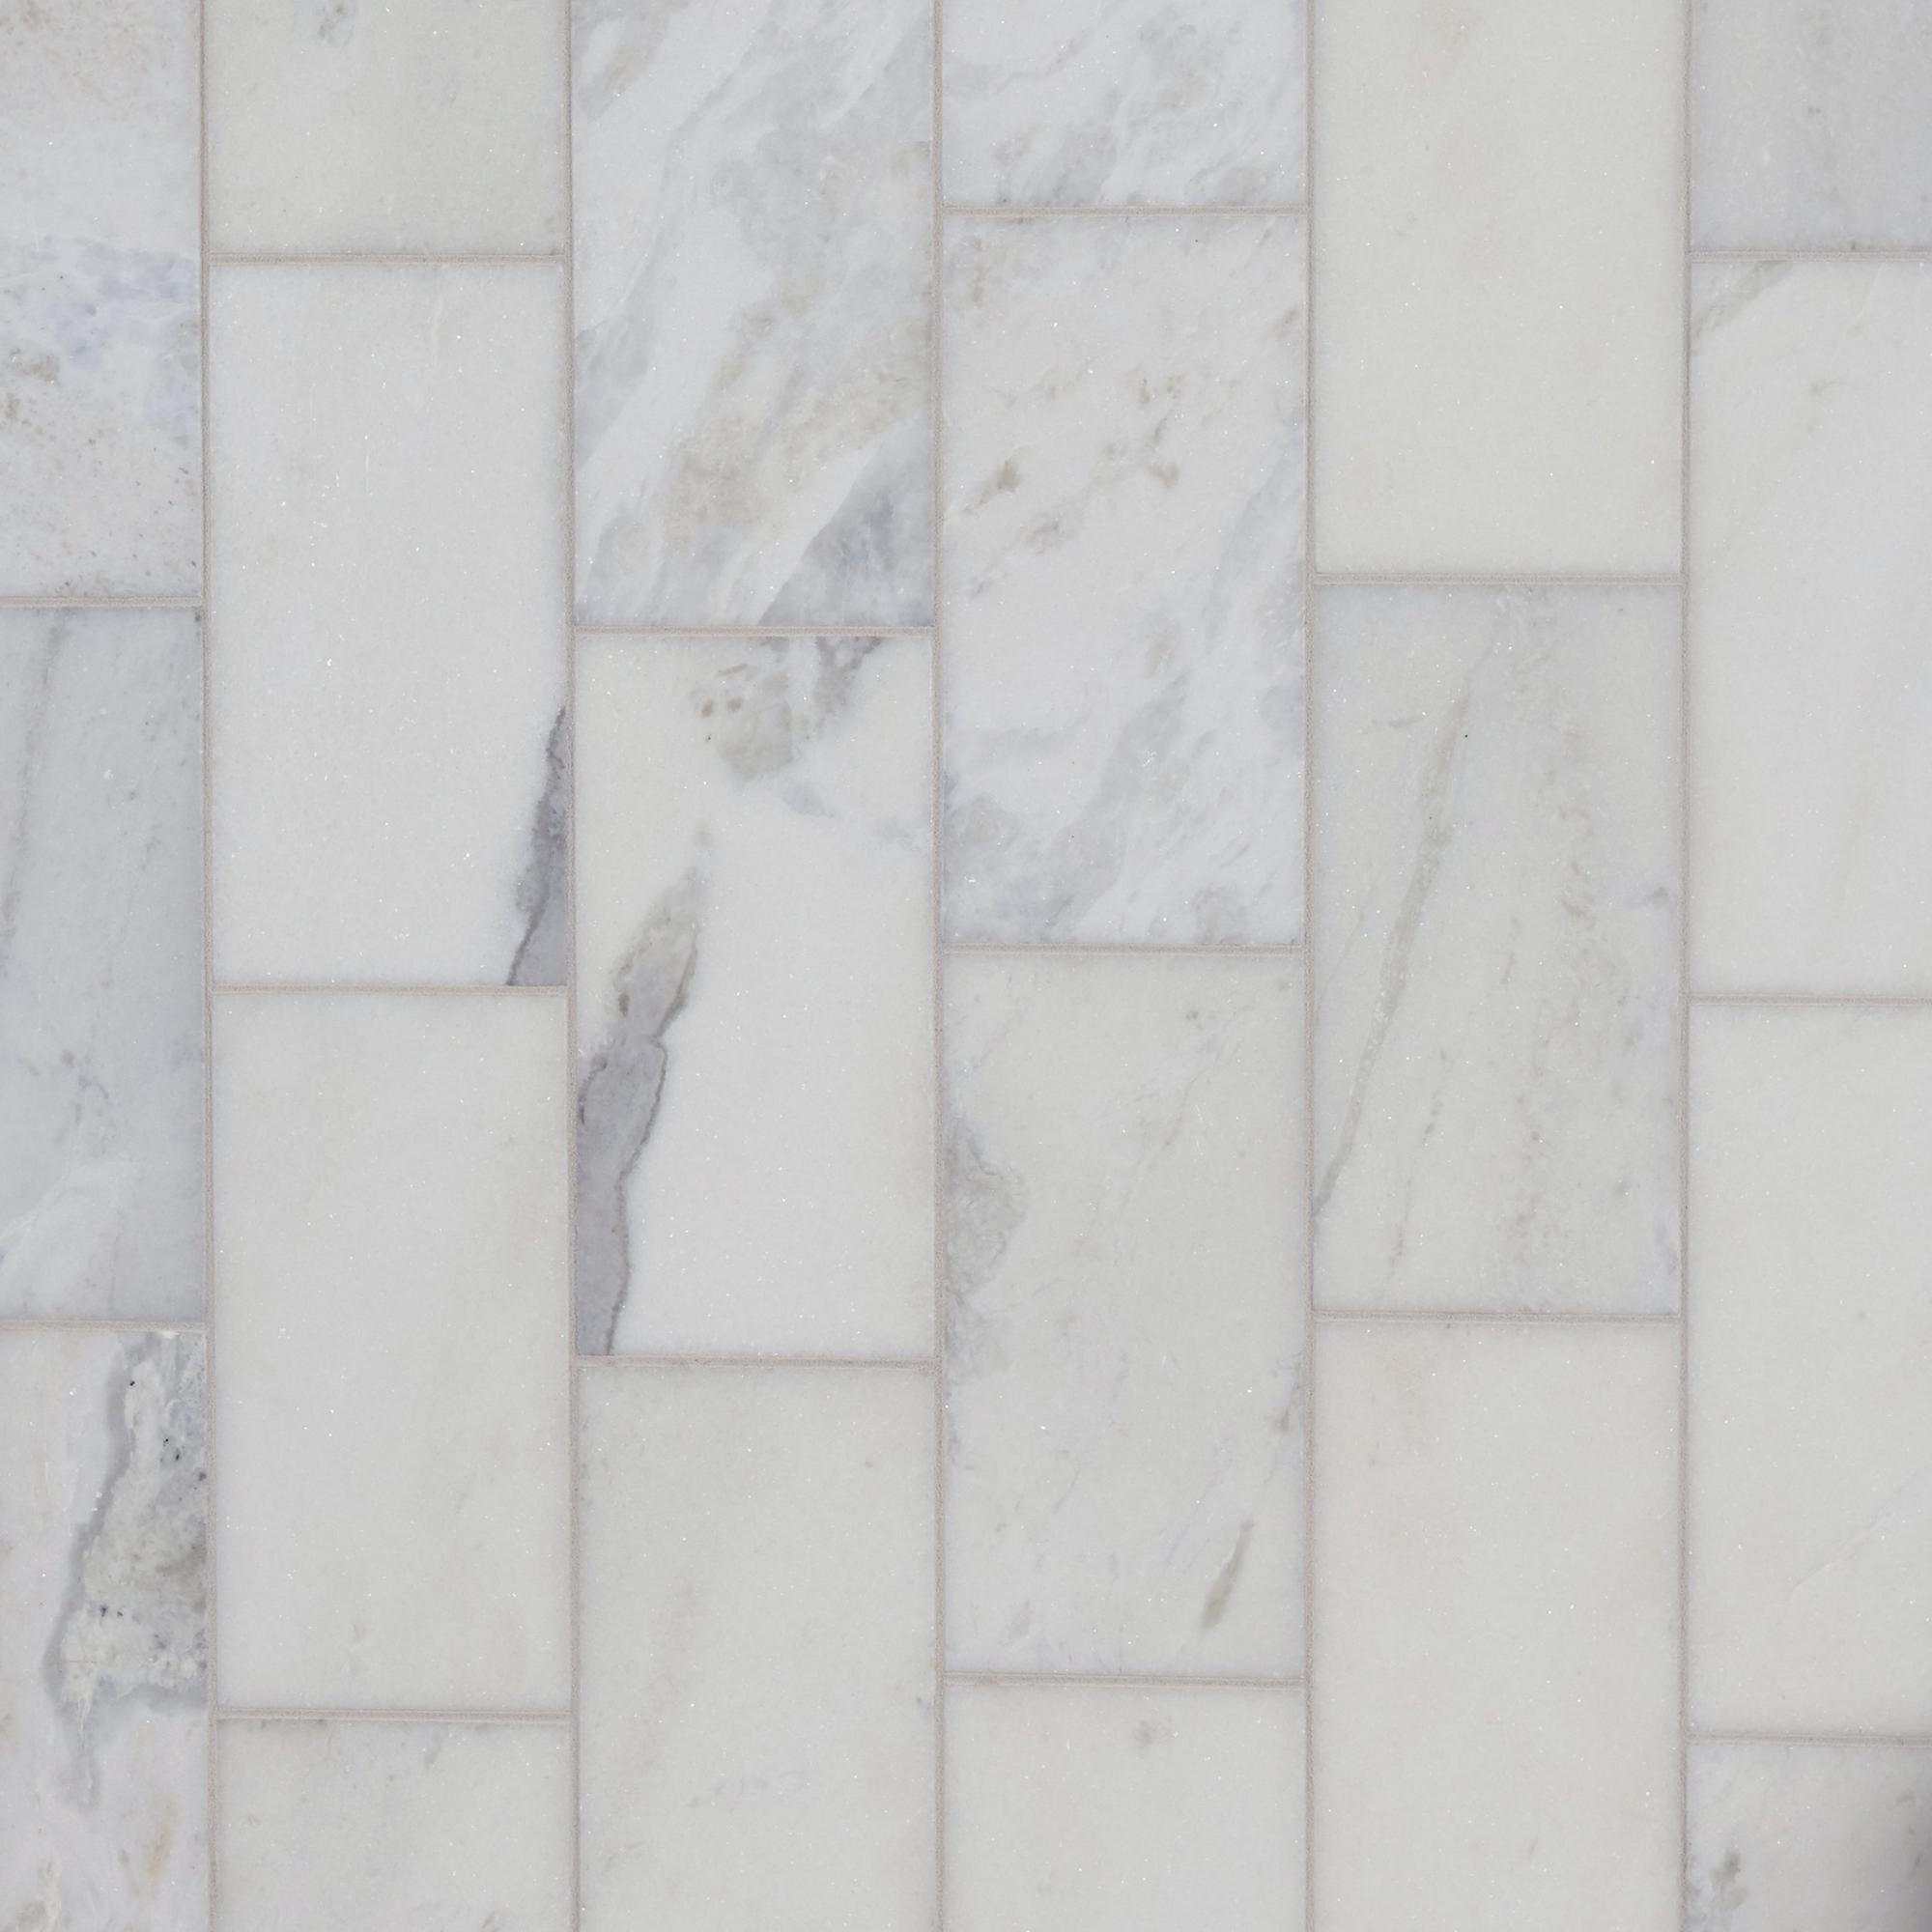 Sahara Carrara Marble Tile Carrara Marble Tile Carrara Marble